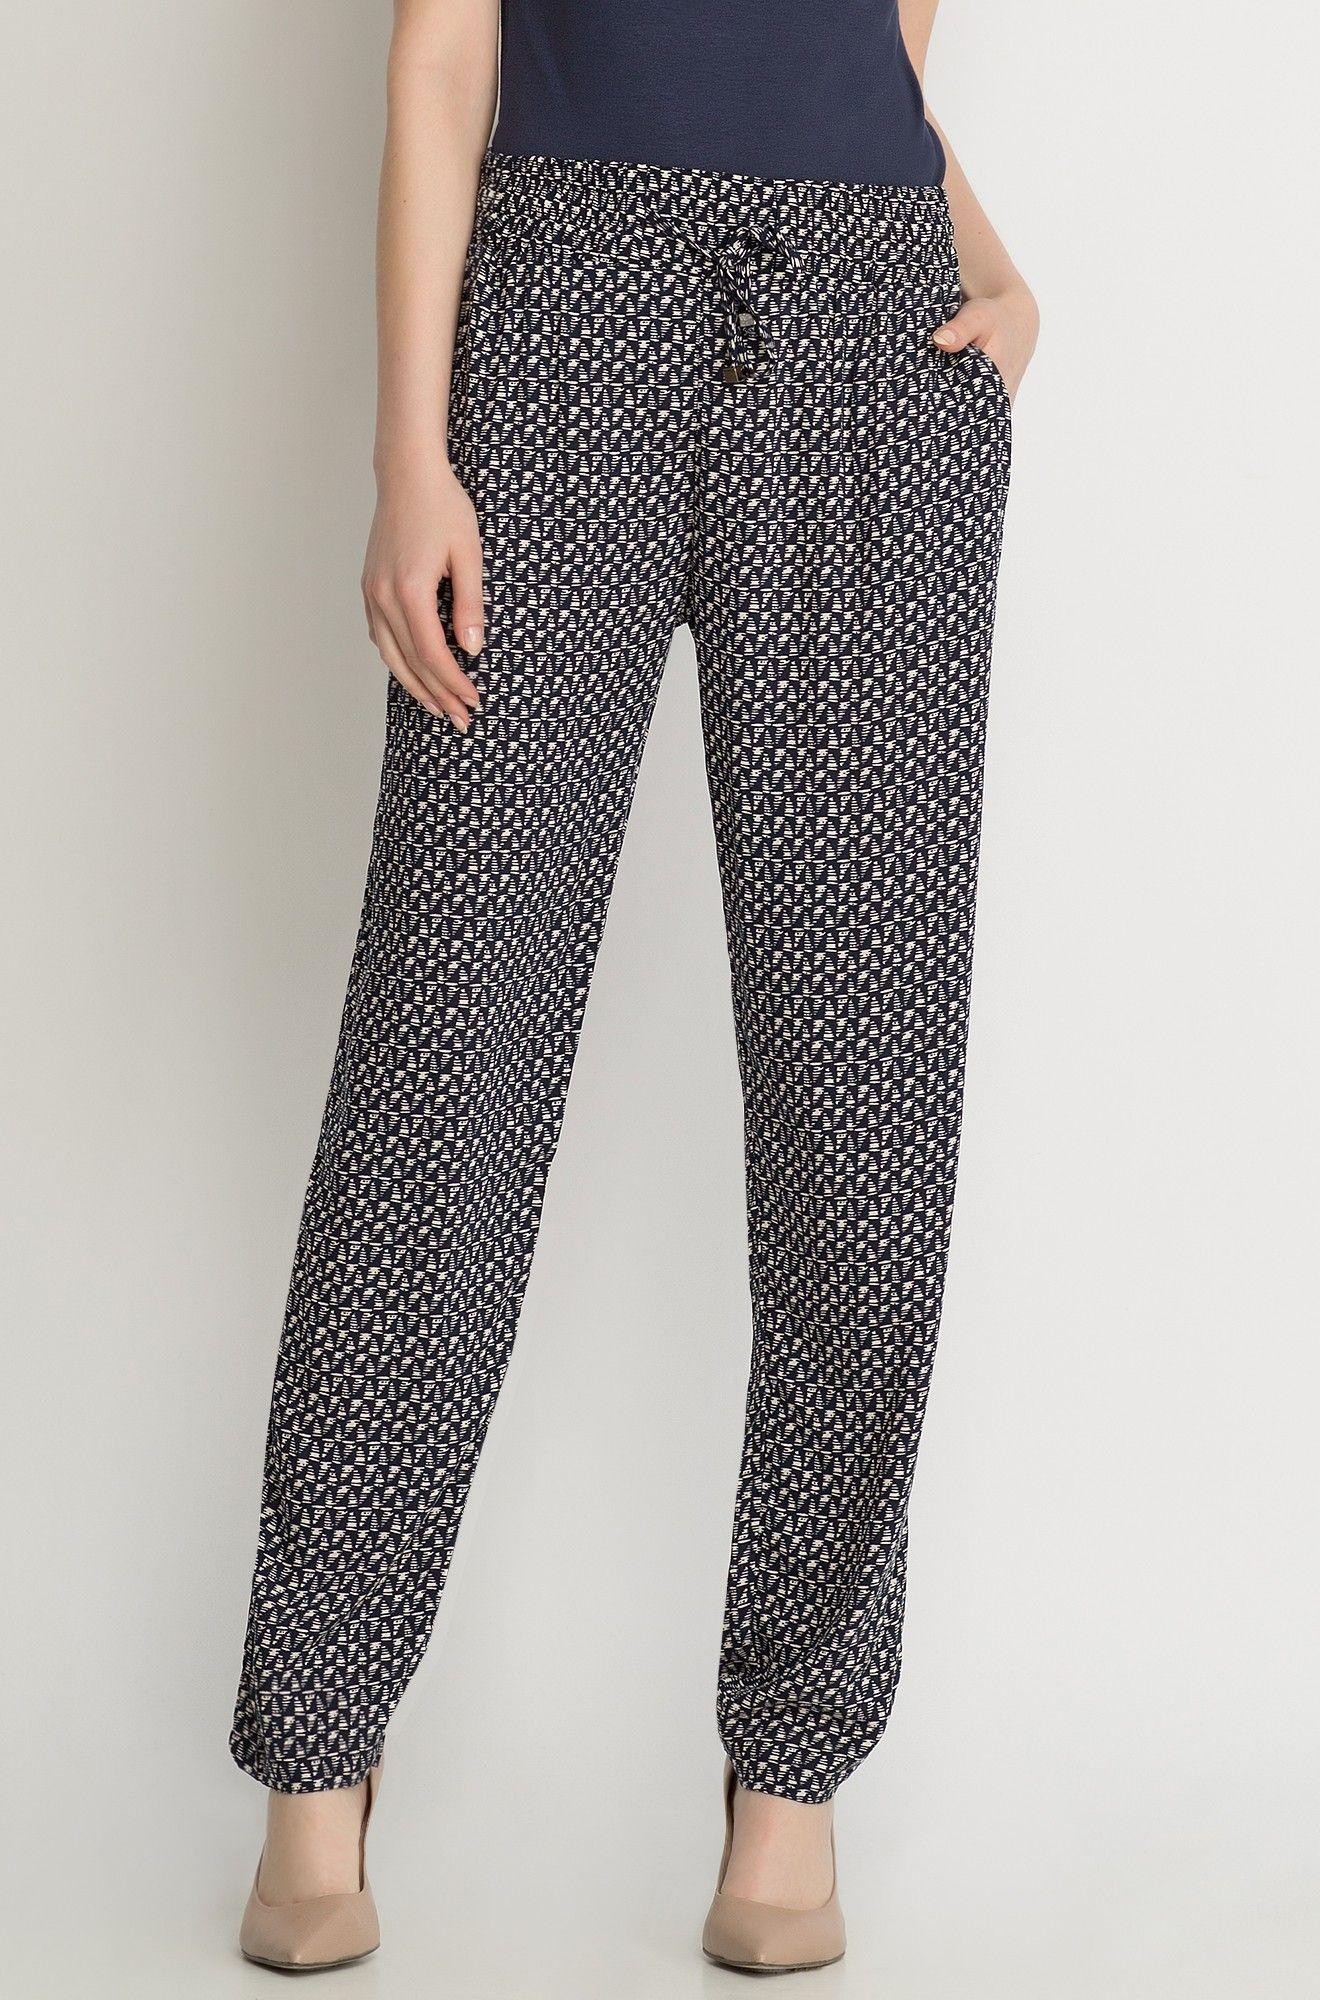 Lockere Stoffhose Mit Muster Fashion Pajama Pants Pants